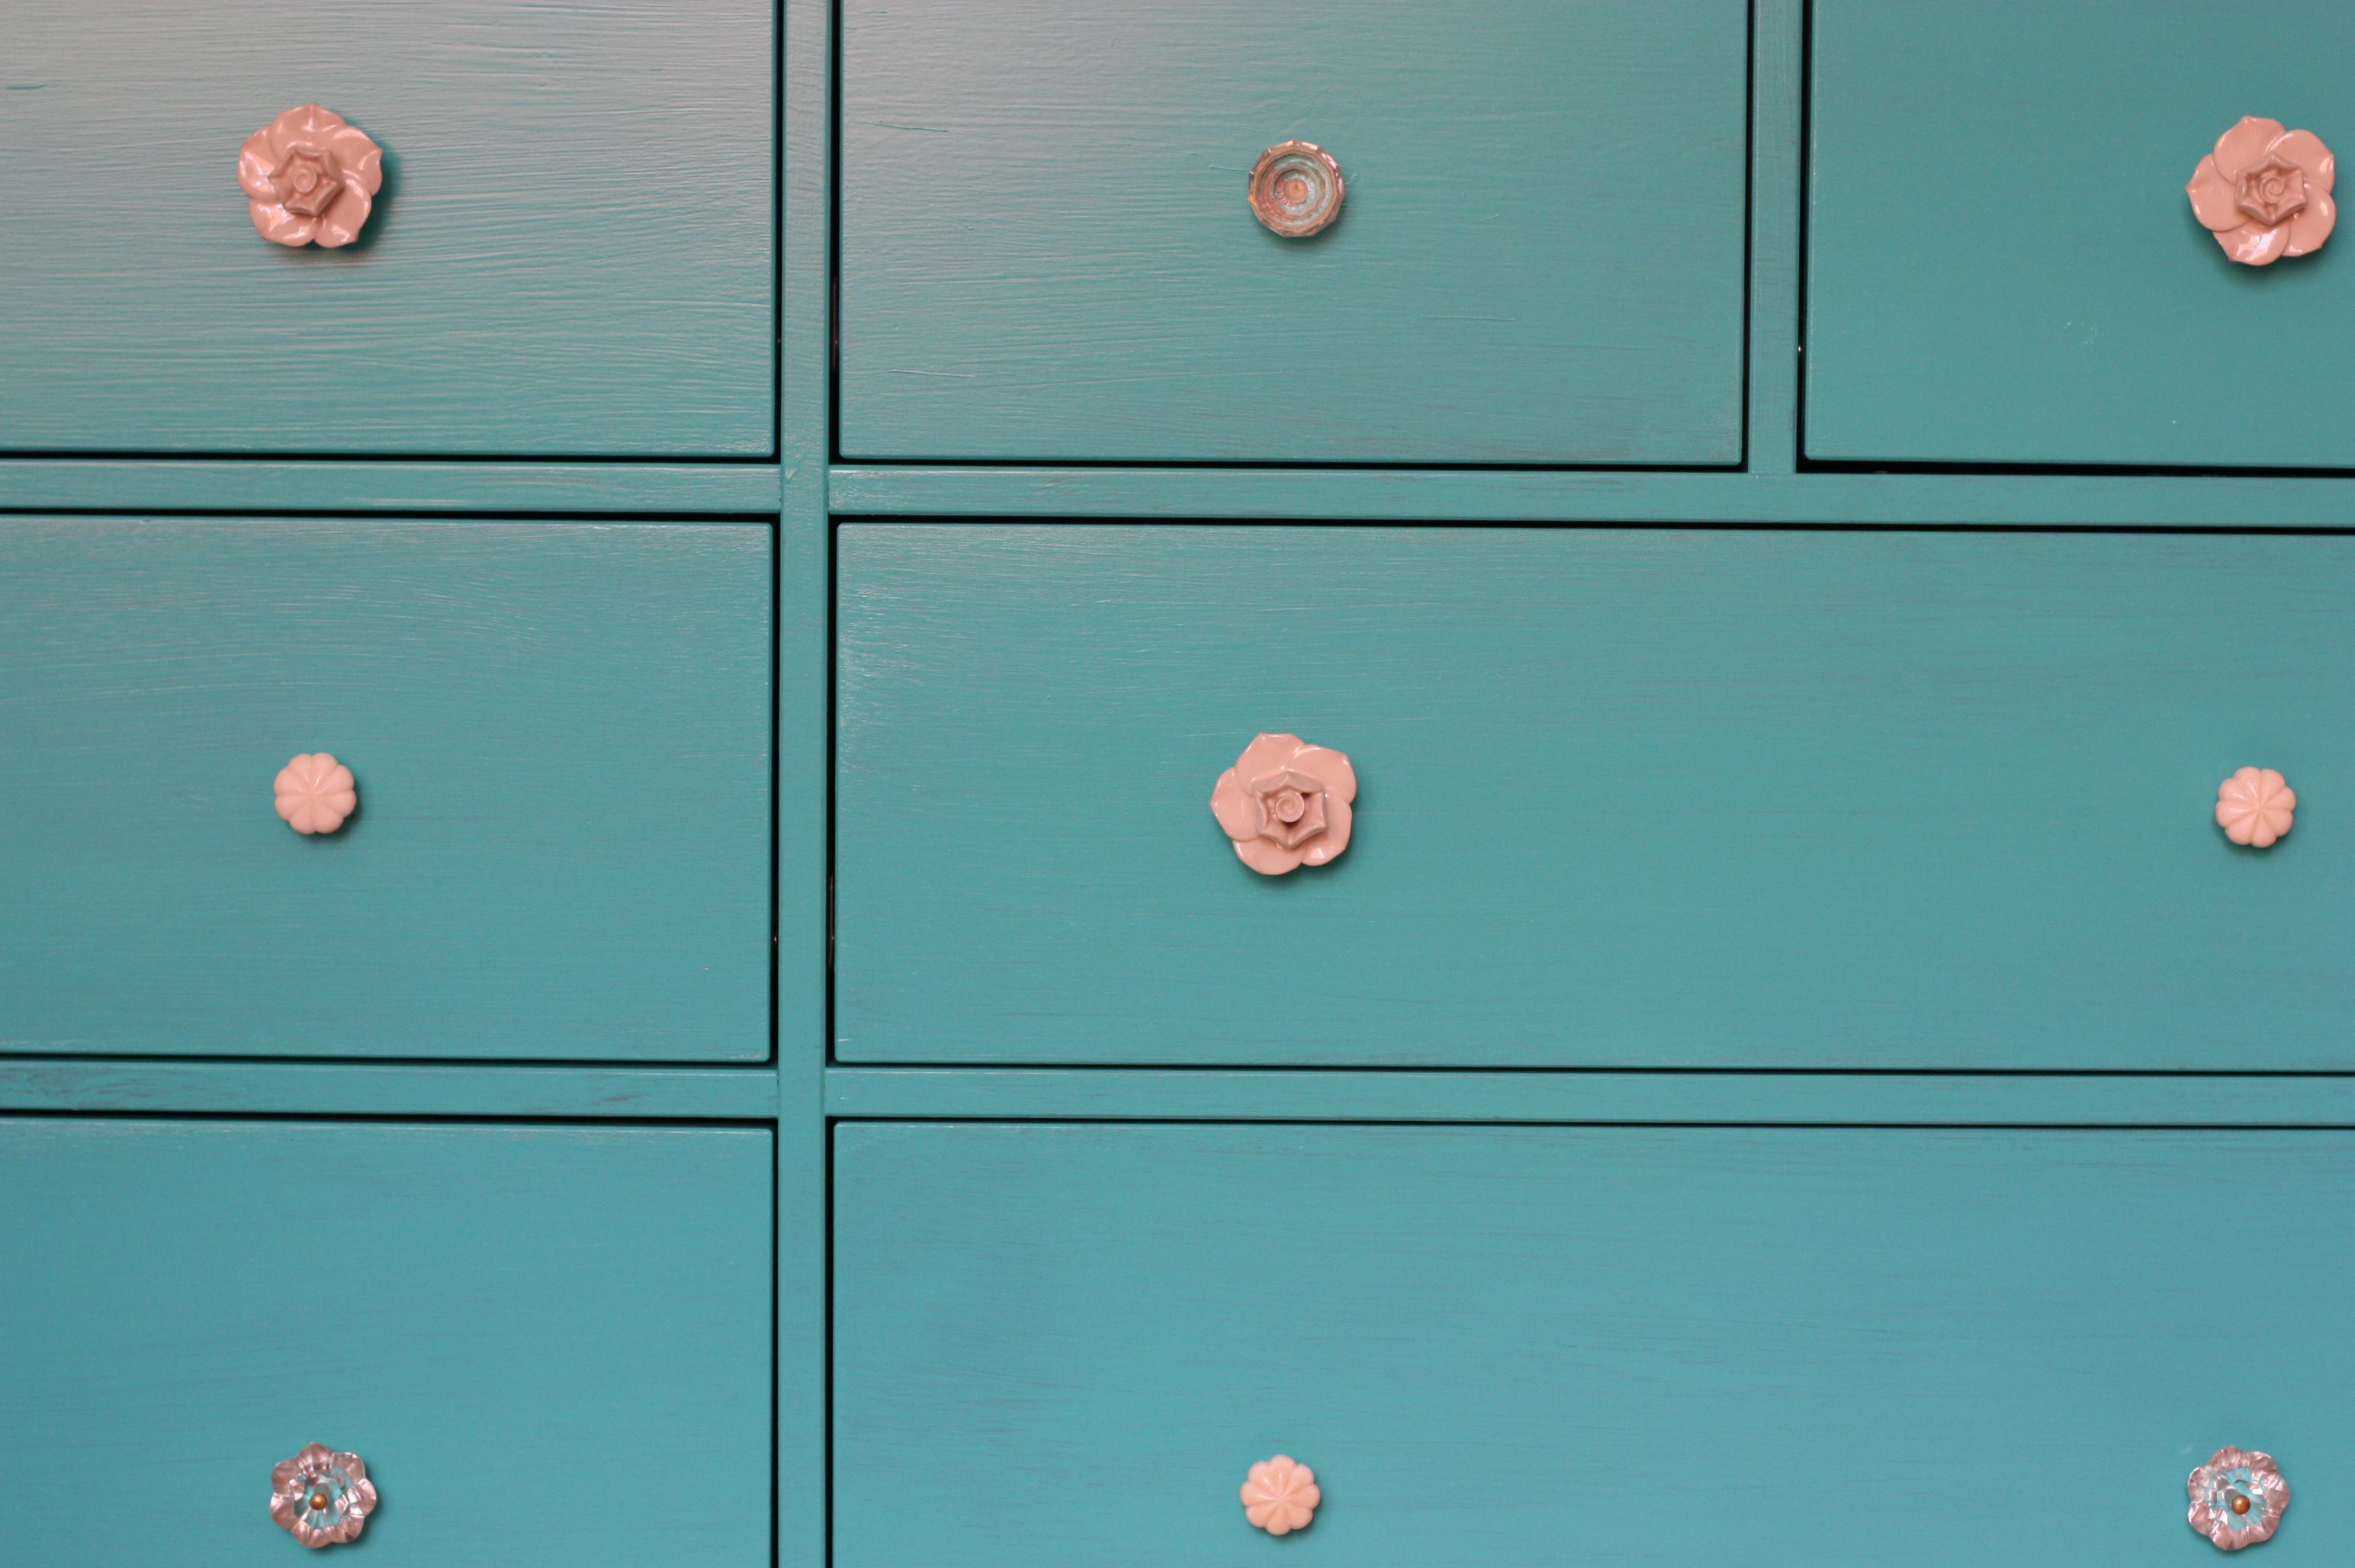 enJOY it by Elise Blaha Cripe: new dresser obsessed.